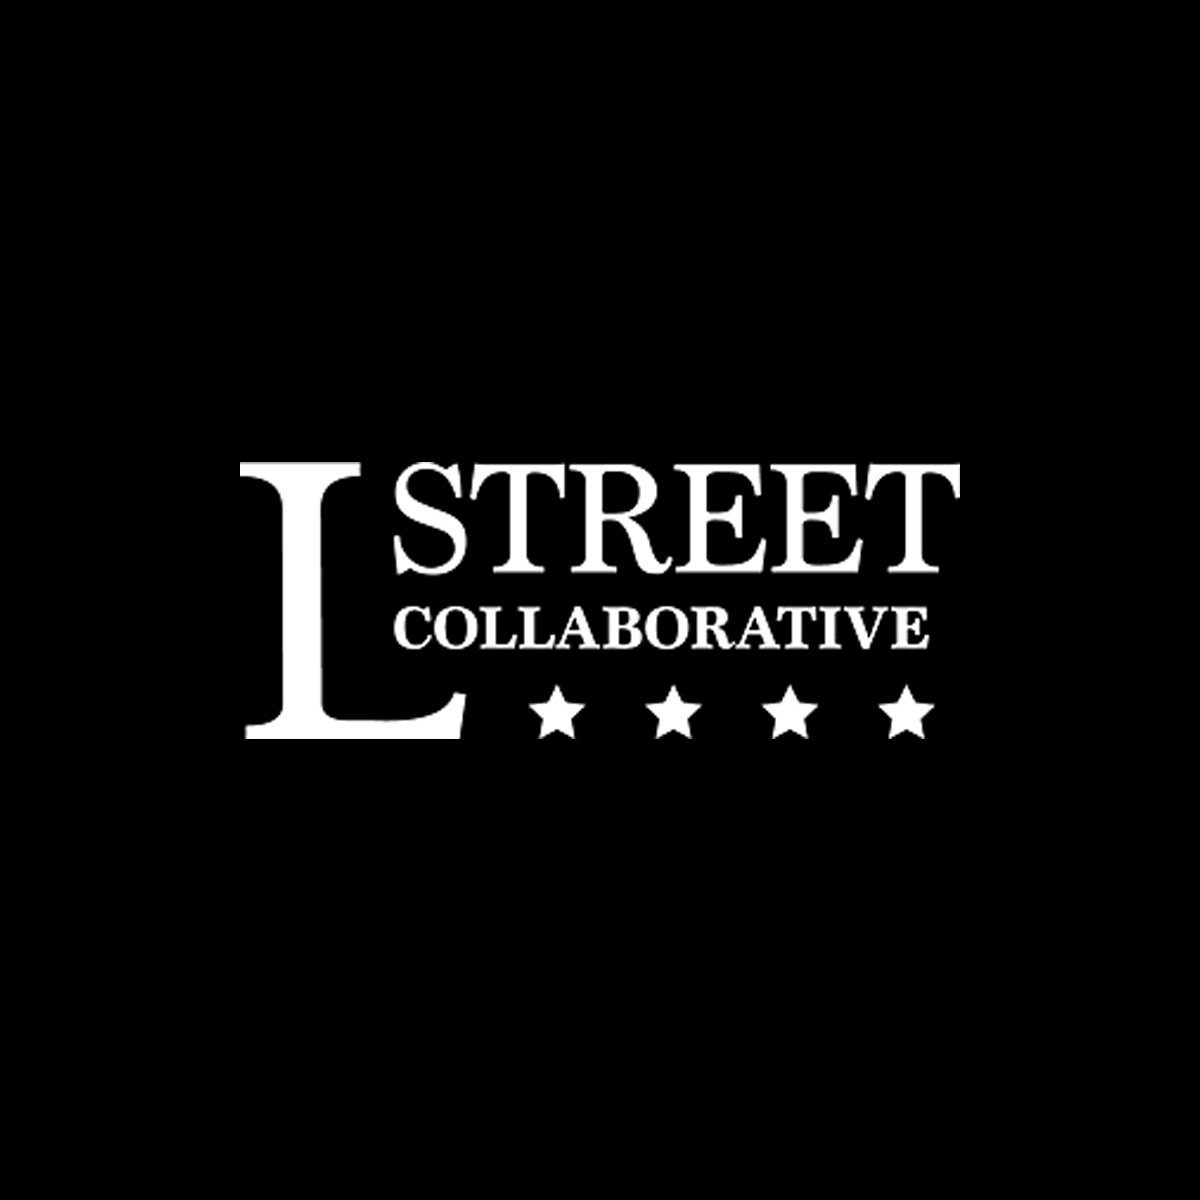 L Street Collaborative